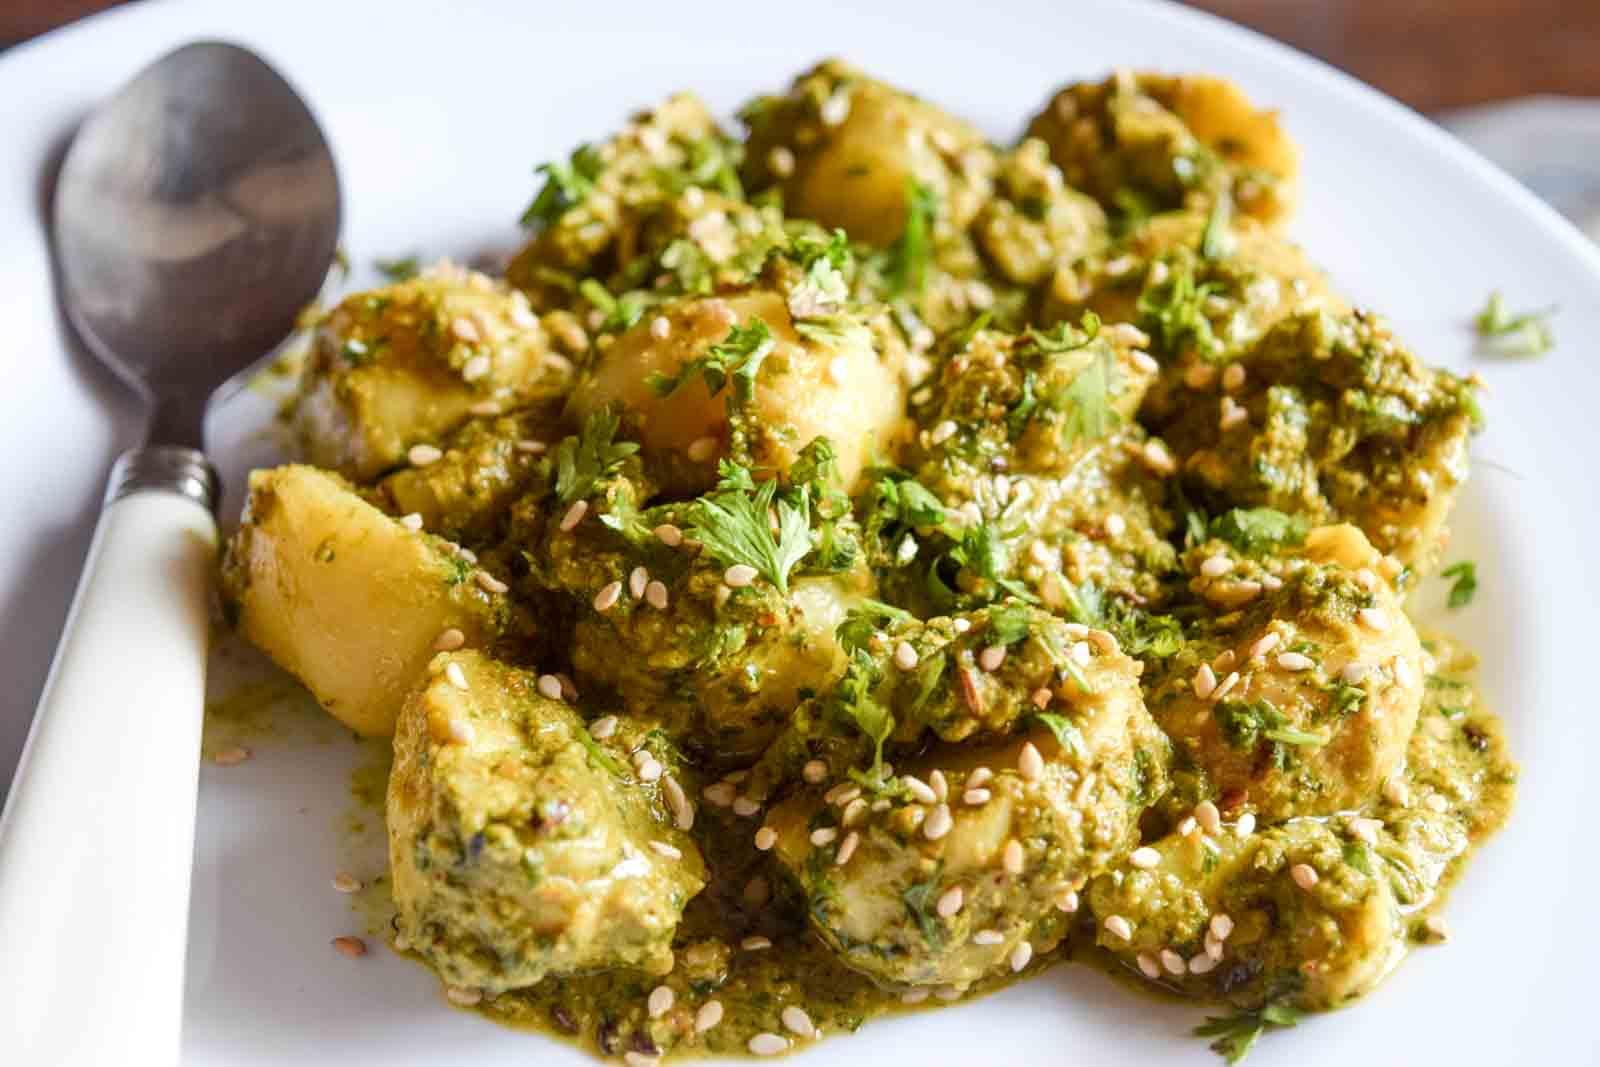 til ke aloo recipe in hindi by archanas til ke aloo recipe in hindi forumfinder Choice Image